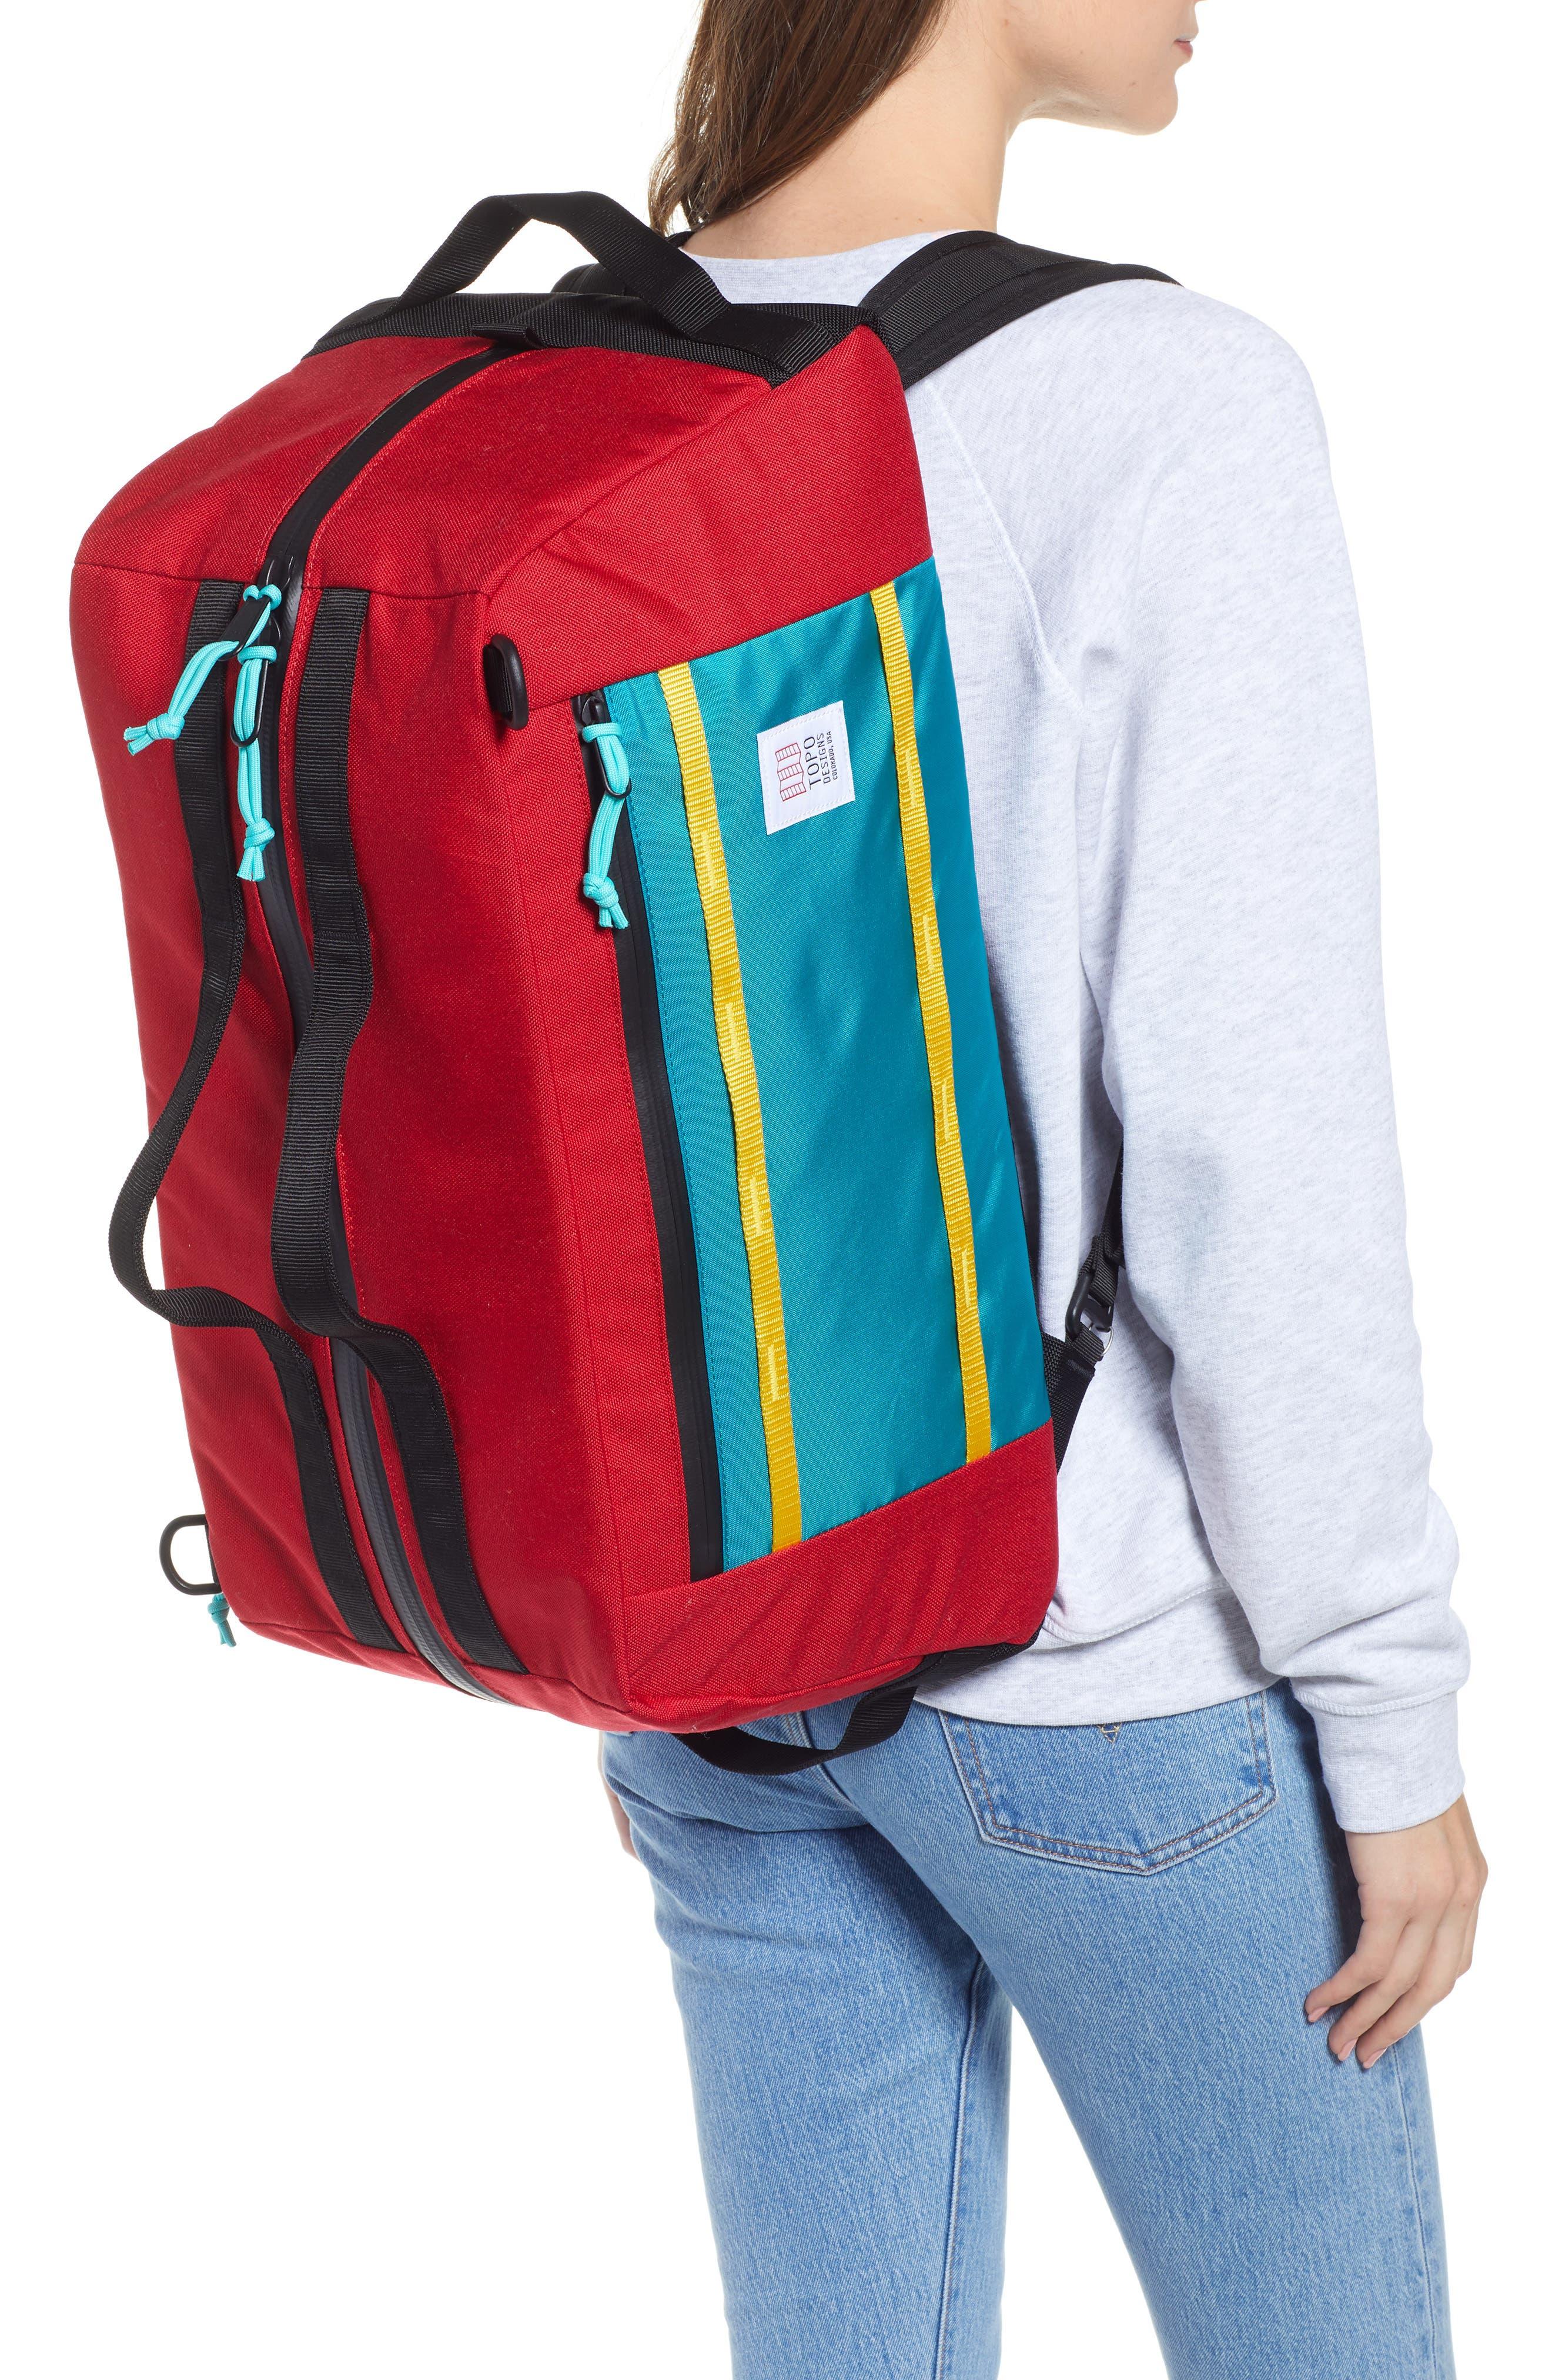 Mountain 40L Convertible Duffel Bag,                             Alternate thumbnail 2, color,                             600